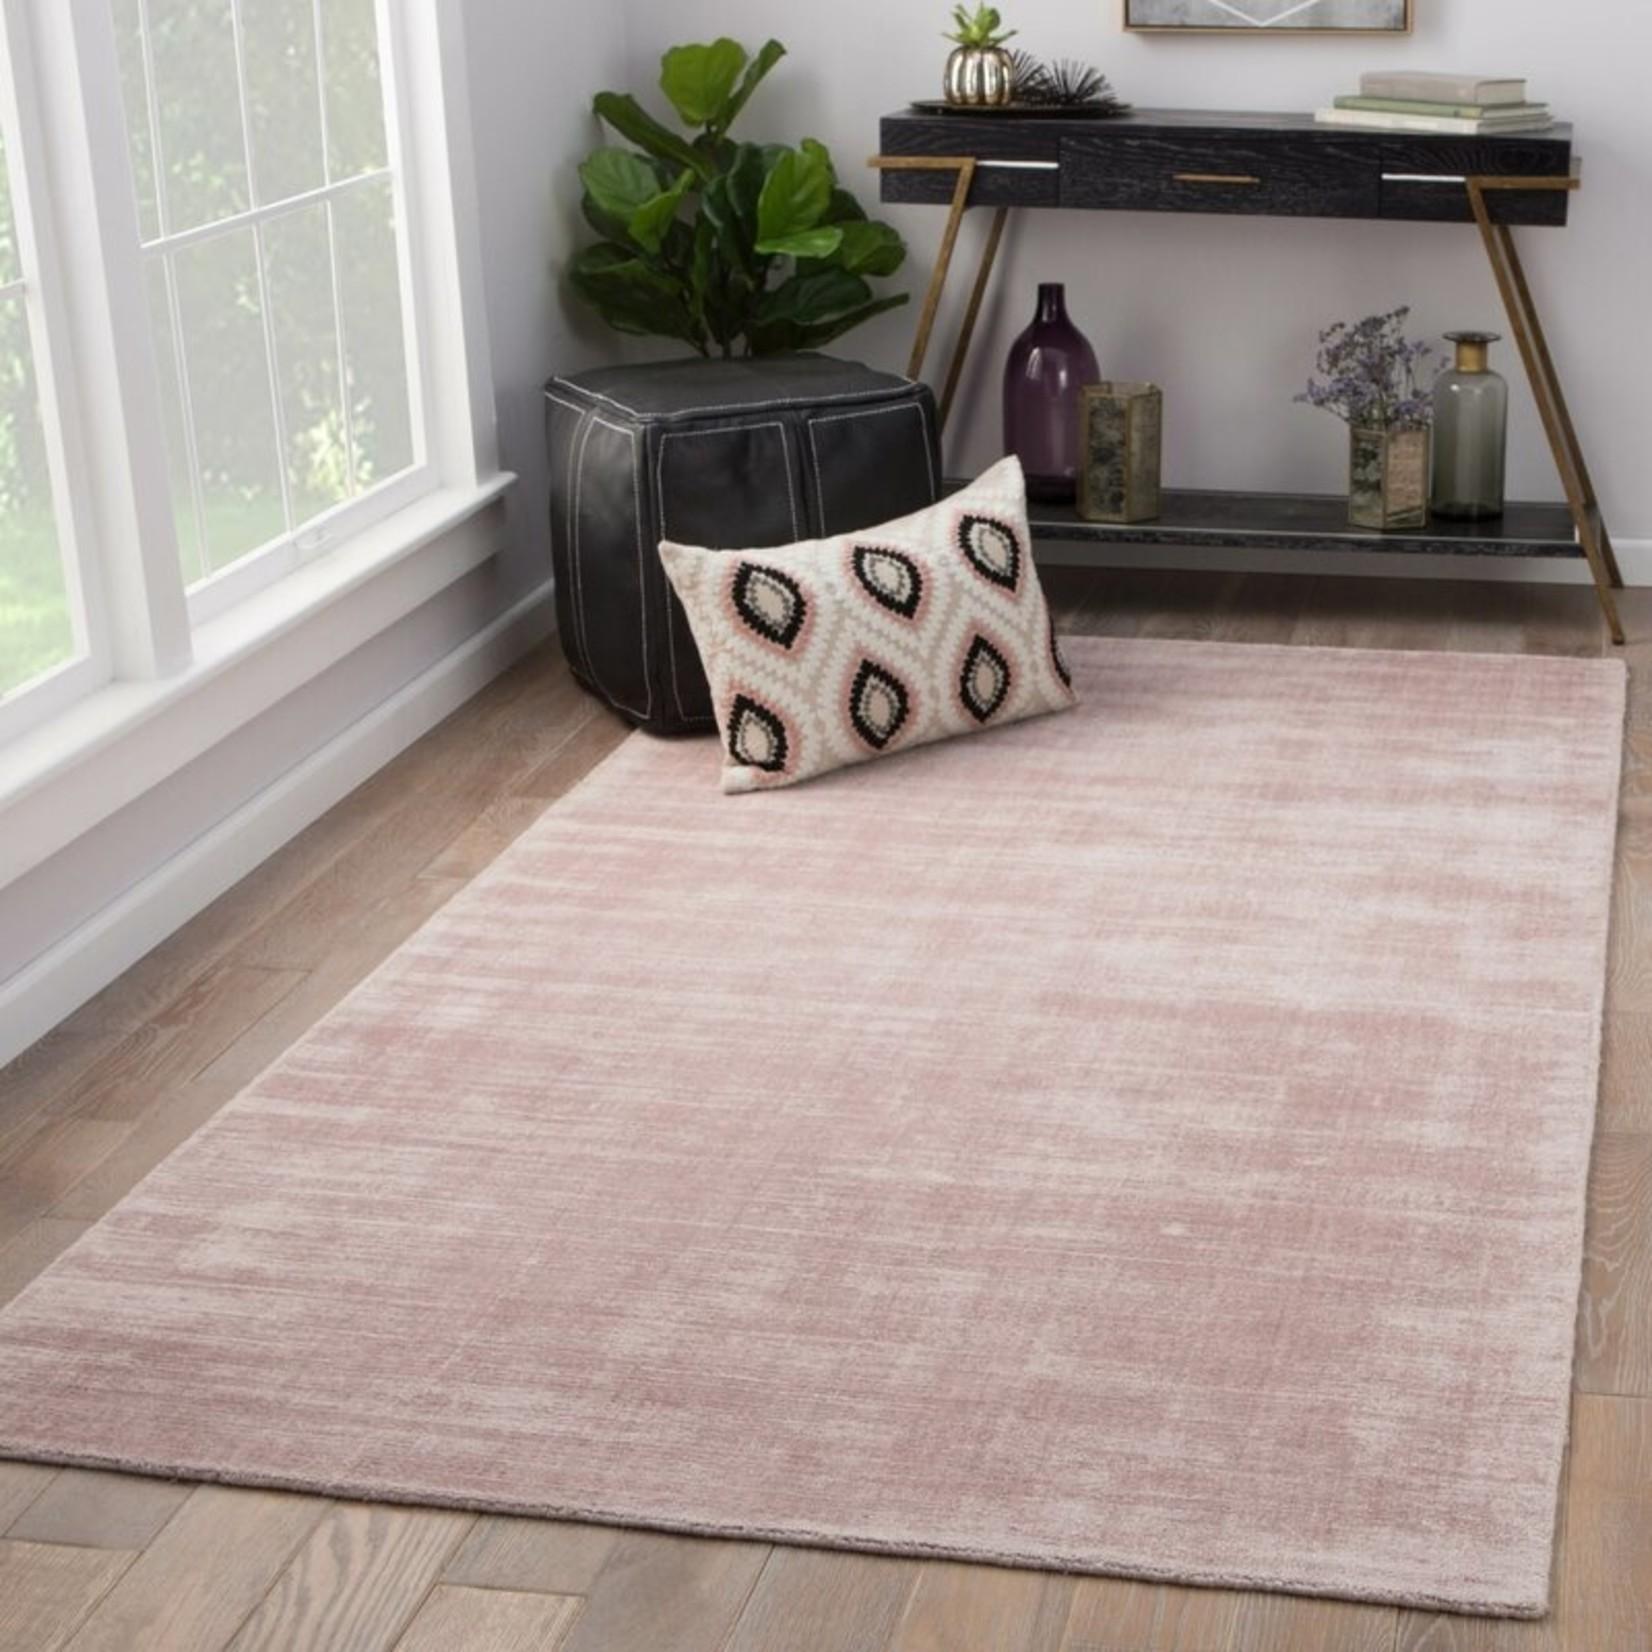 *8' x 10' - Hand-Loomed Pink Area Rug